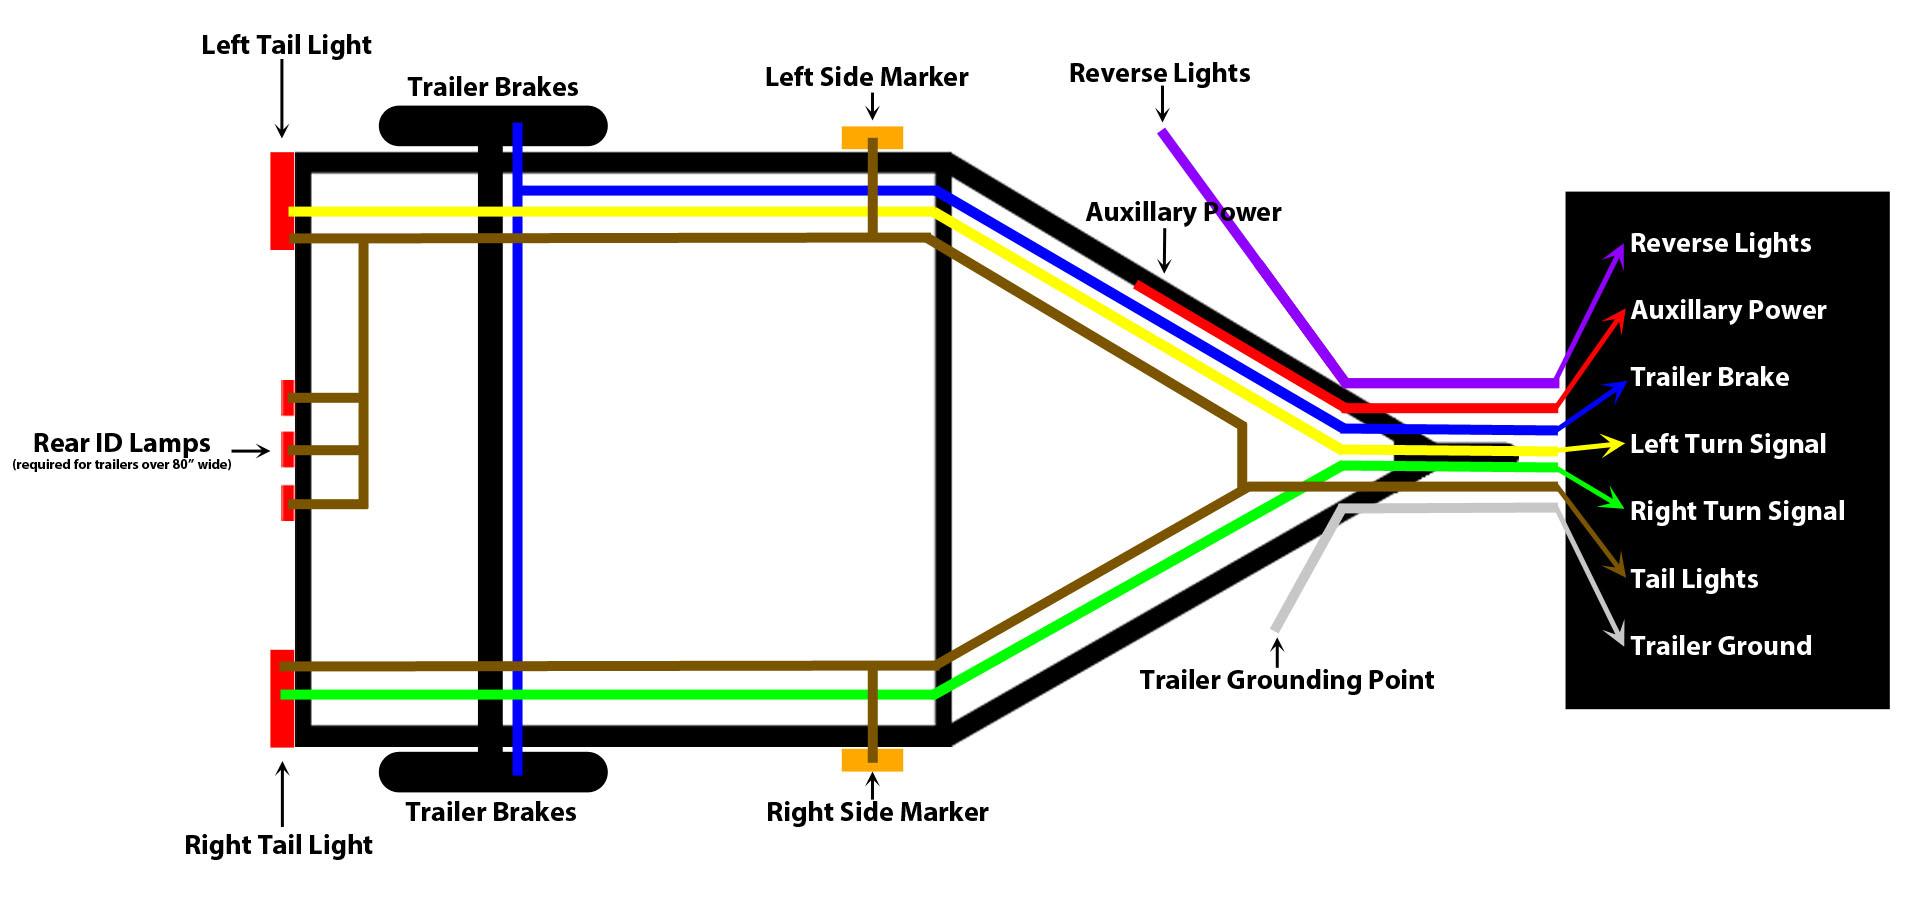 7 Pin Trailer Harness | Manual E-Books - 4 Pin Wiring Diagram